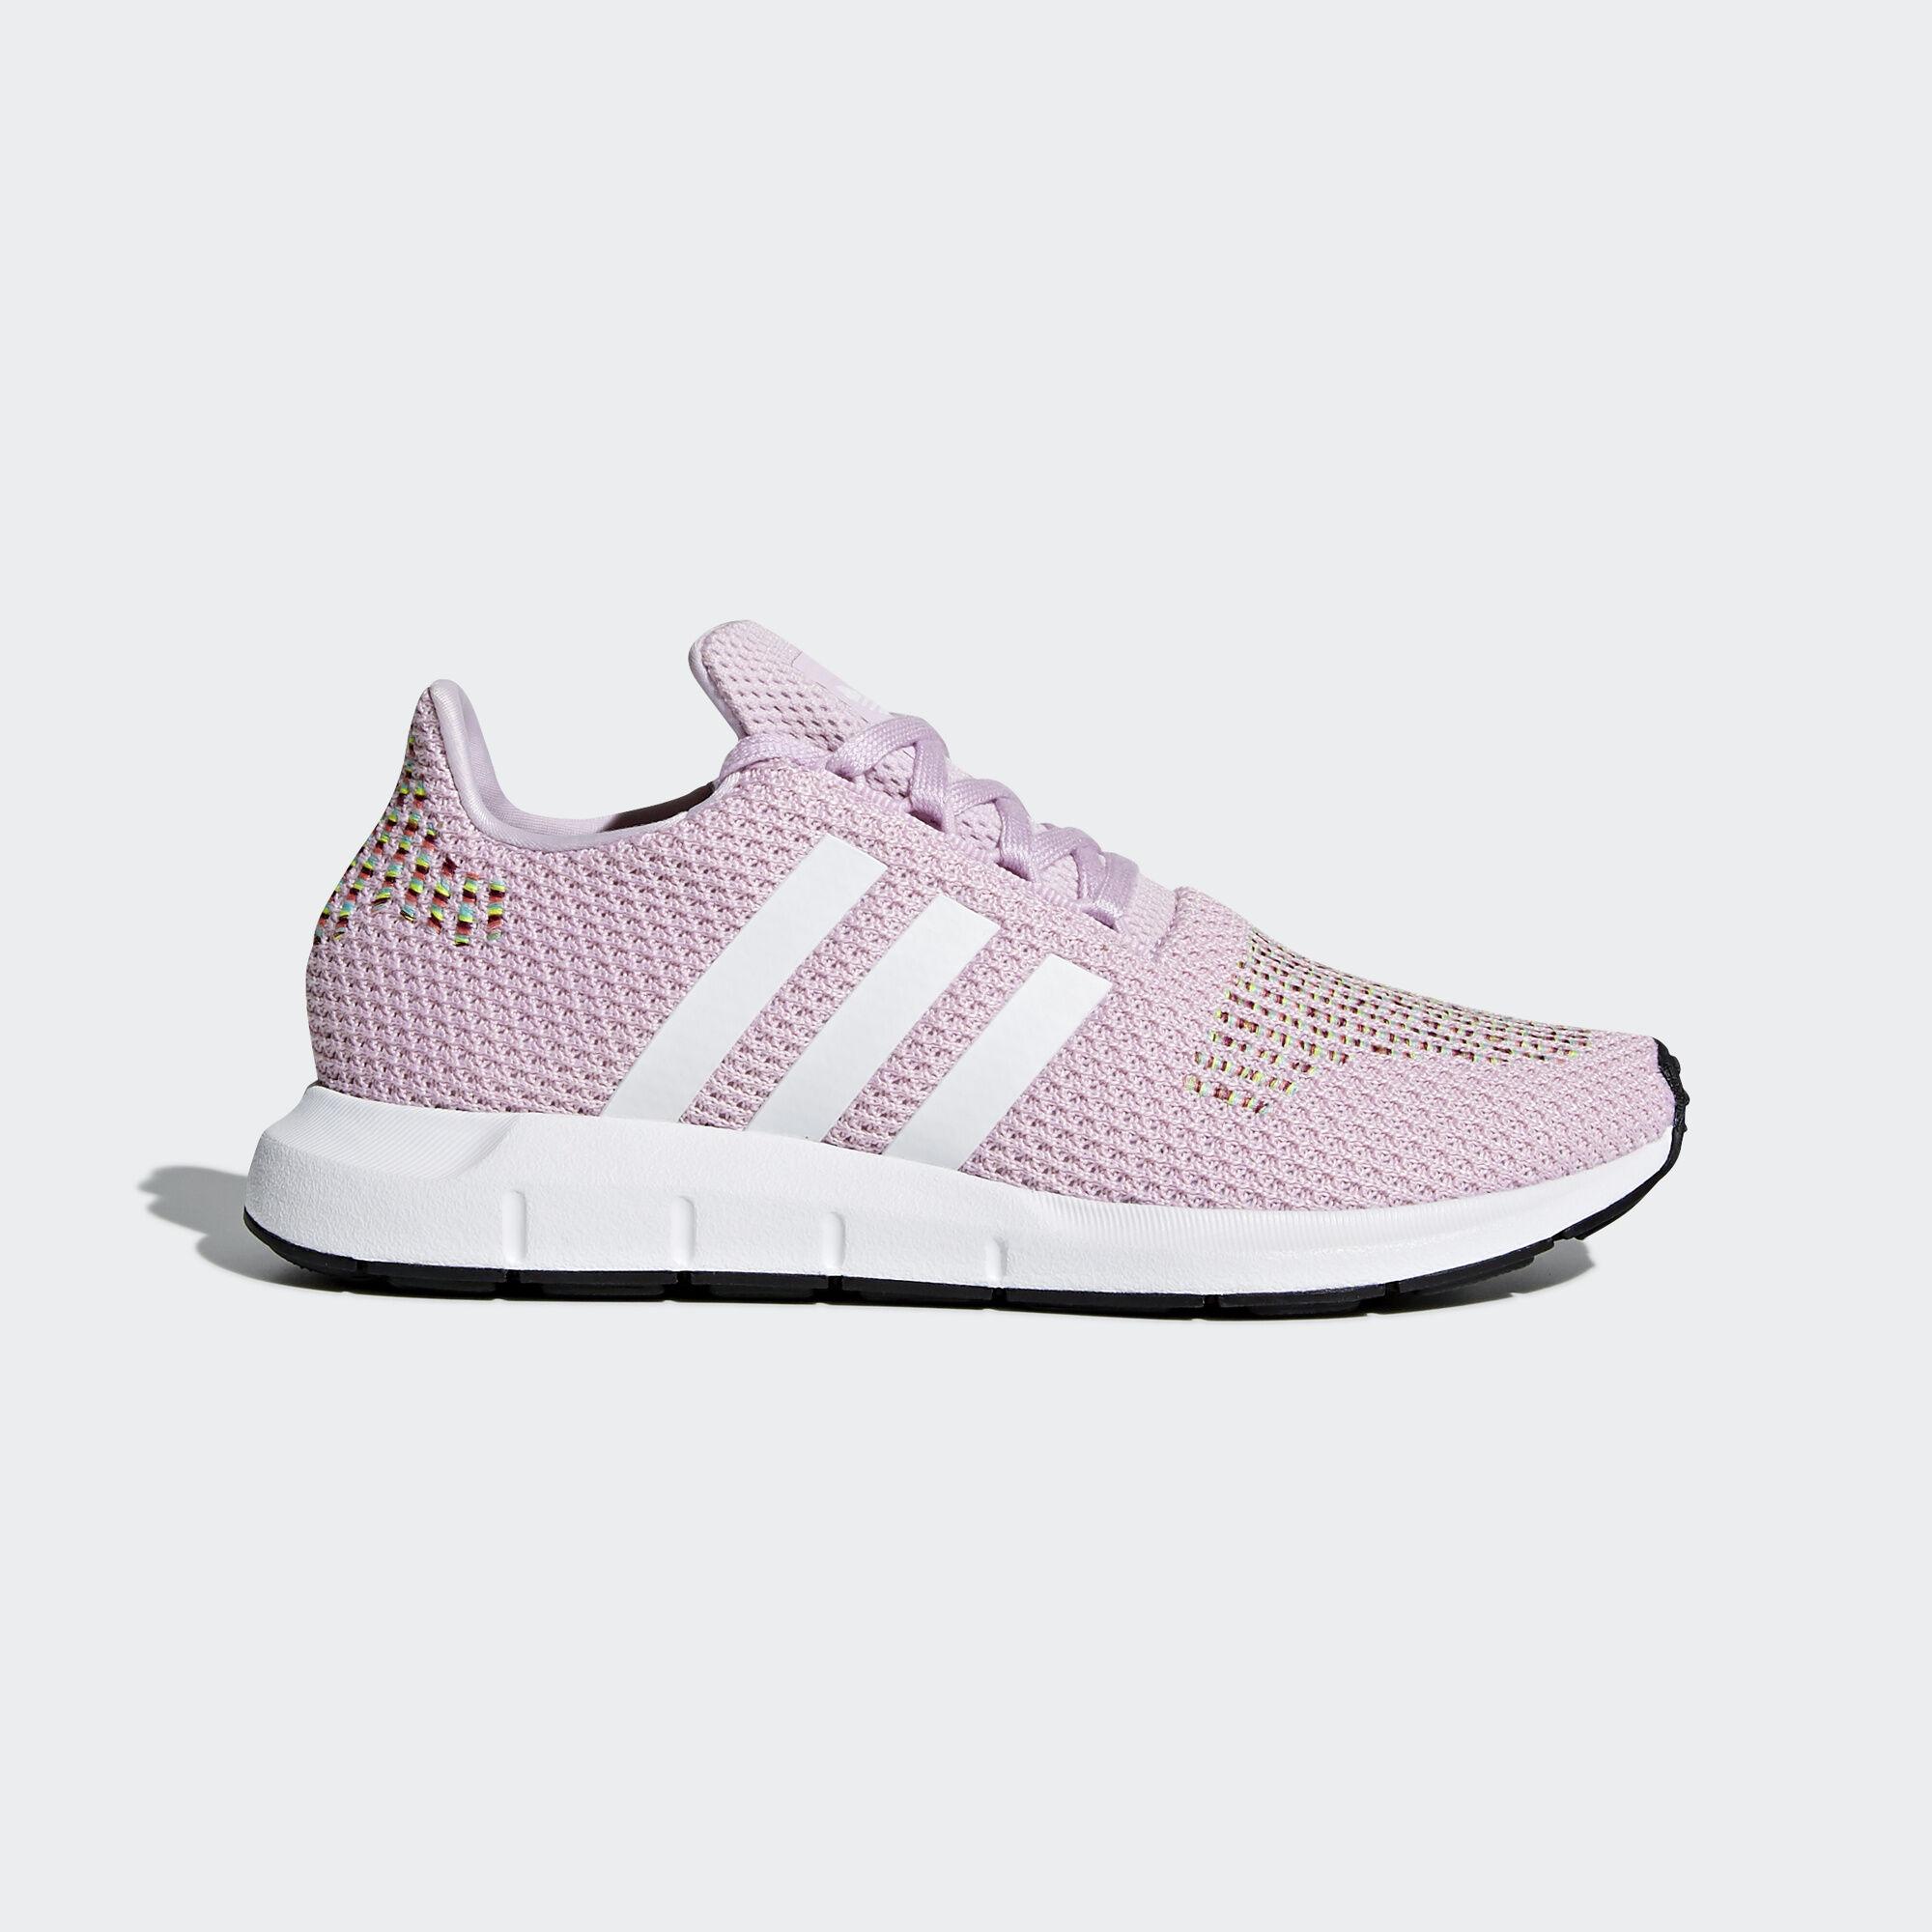 adidas - Swift Run Shoes Aero Pink Ftwr White Core Black CQ2023 fdd77f593014d